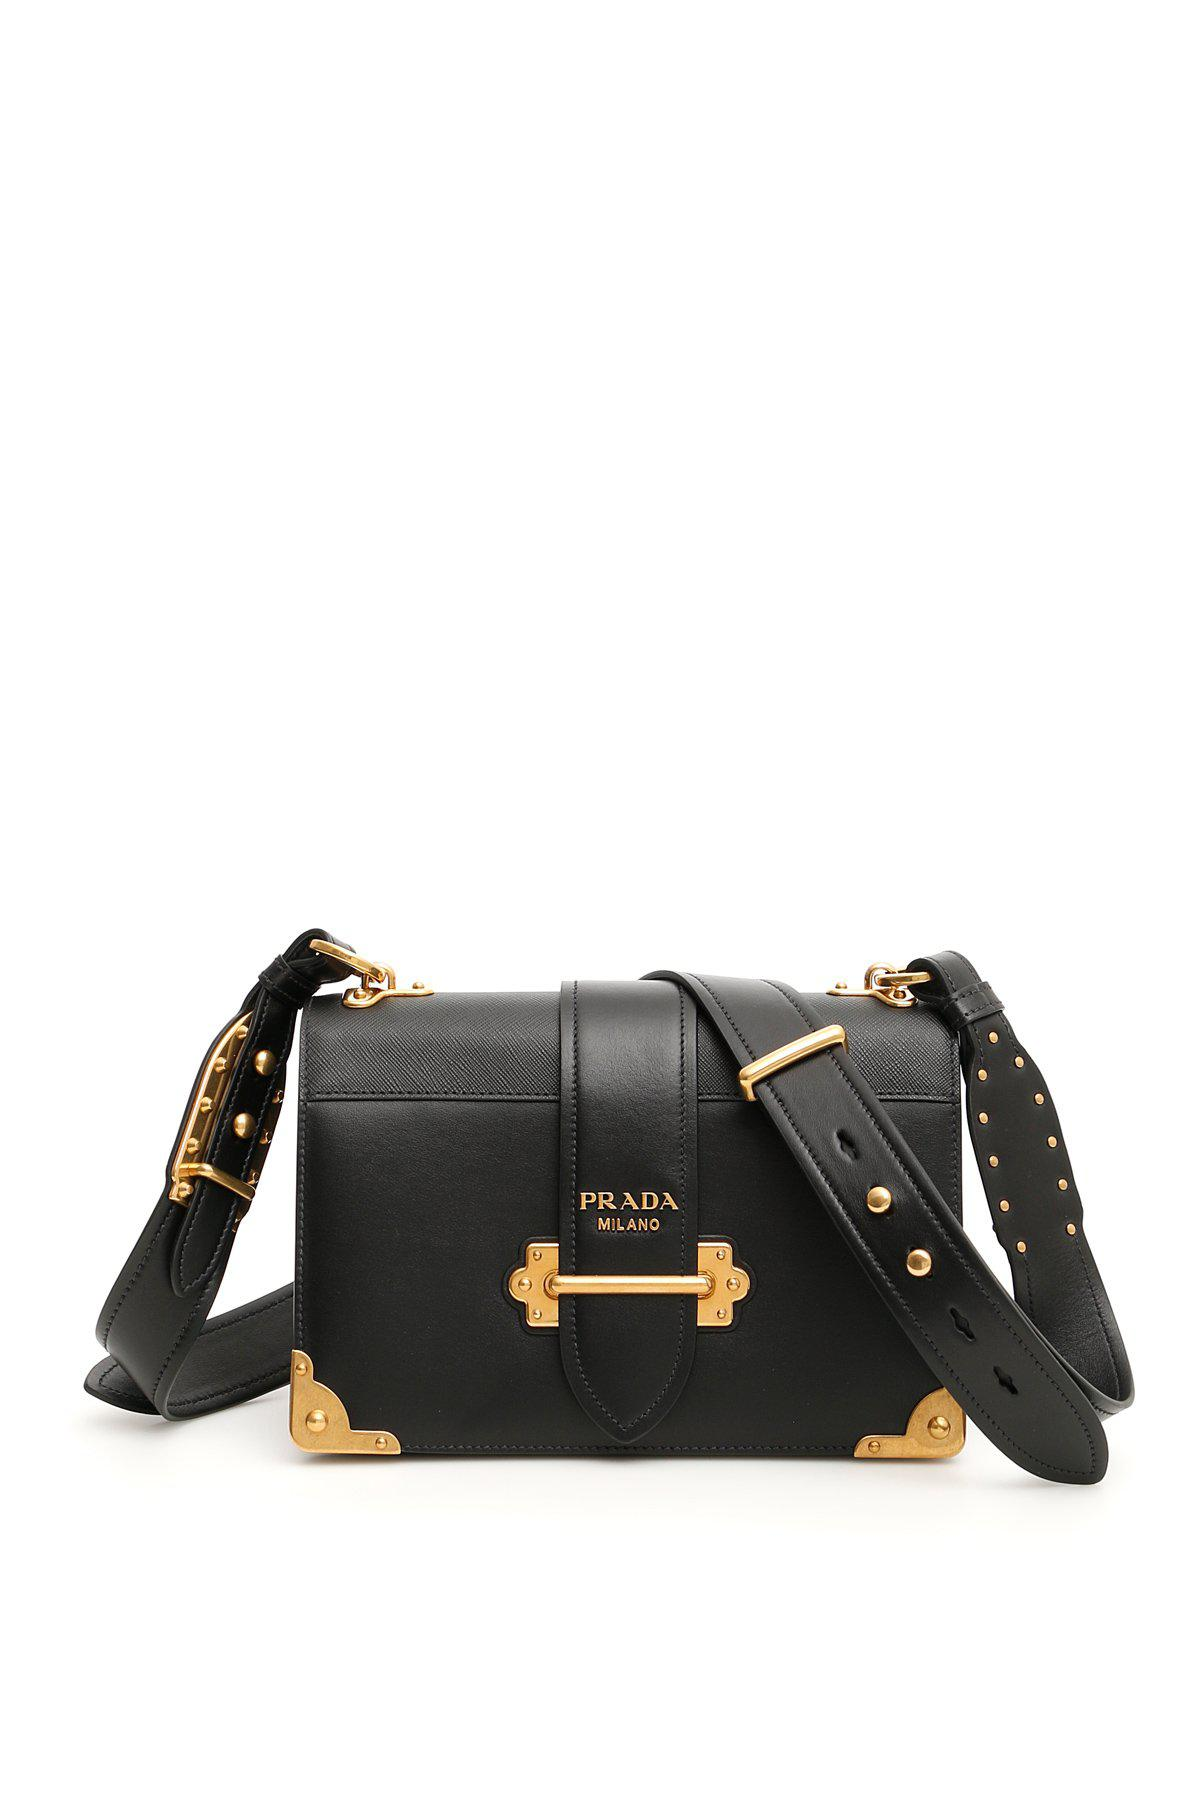 f33d0ecce11fc4 Prada Logo Cahier Shoulder Bag in Black - Lyst